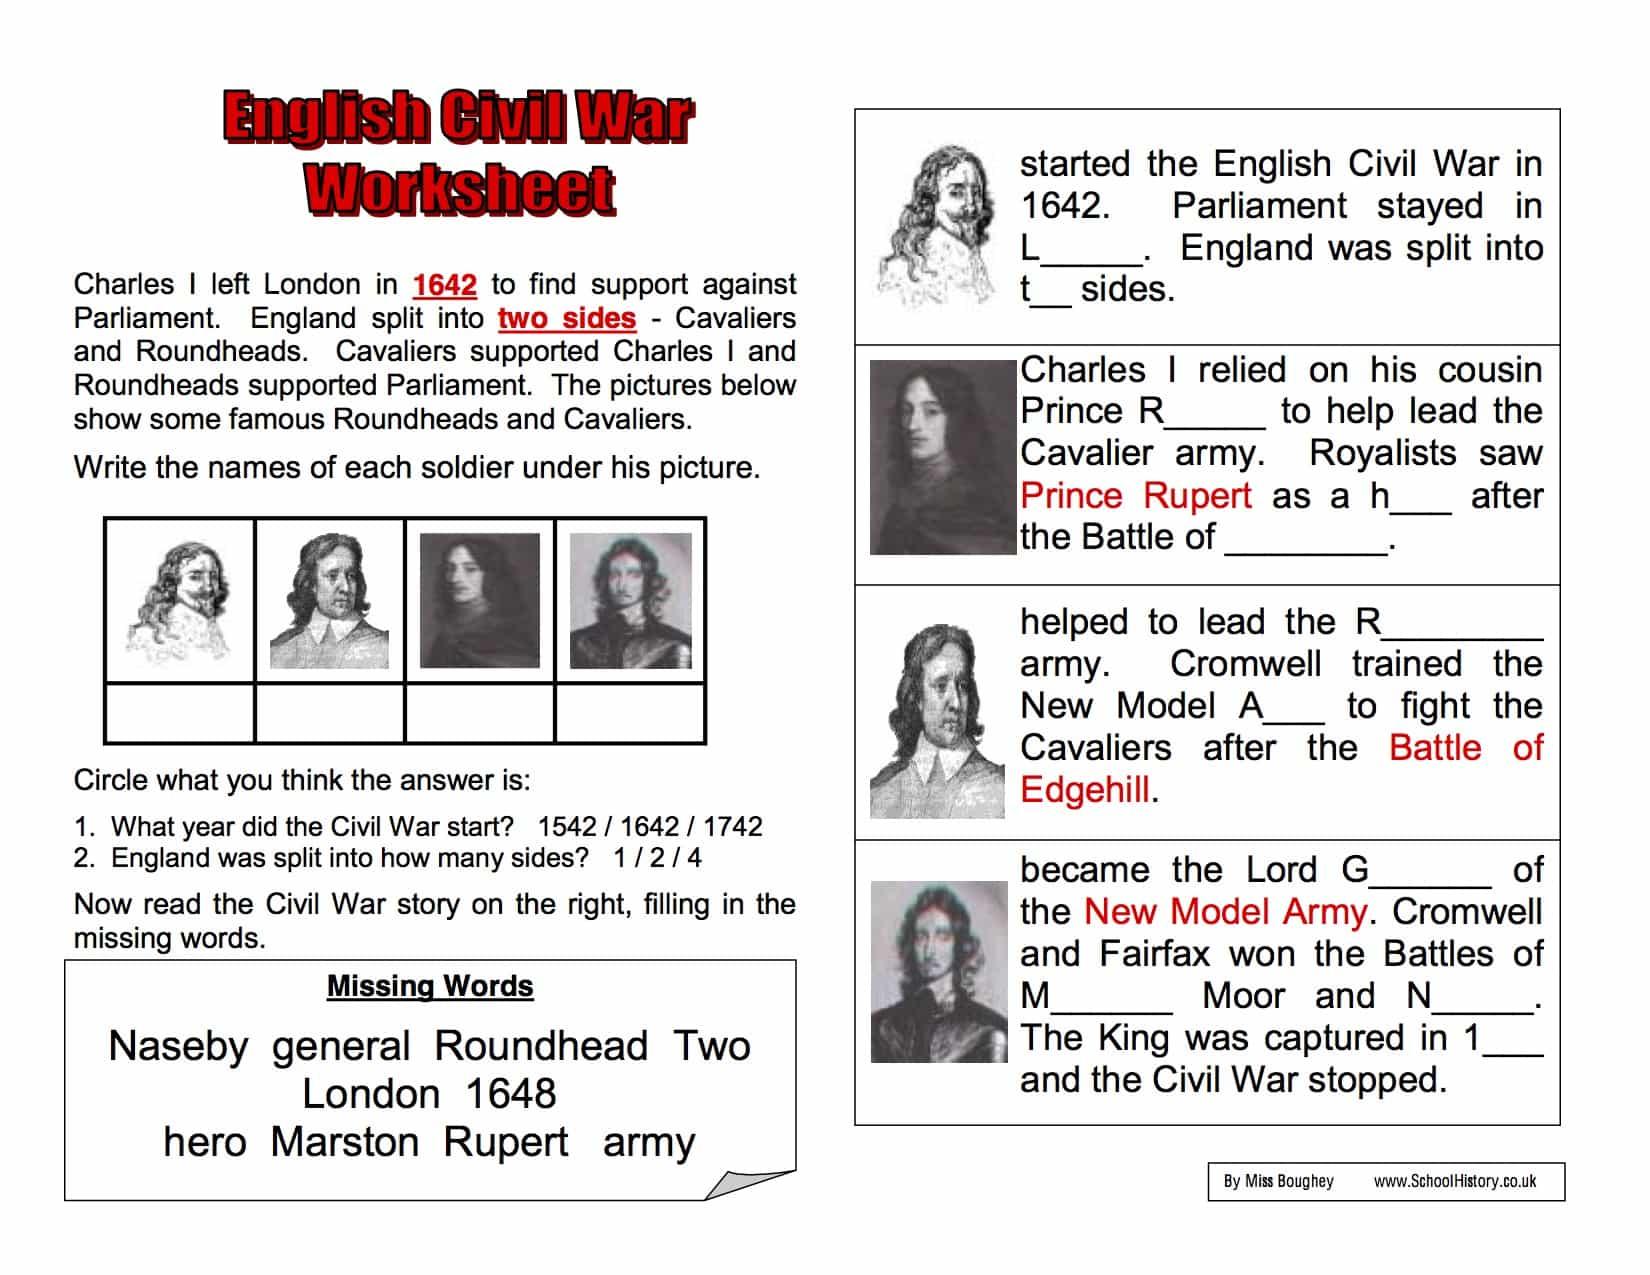 English Civil War Background Worksheet | Year 8 Study